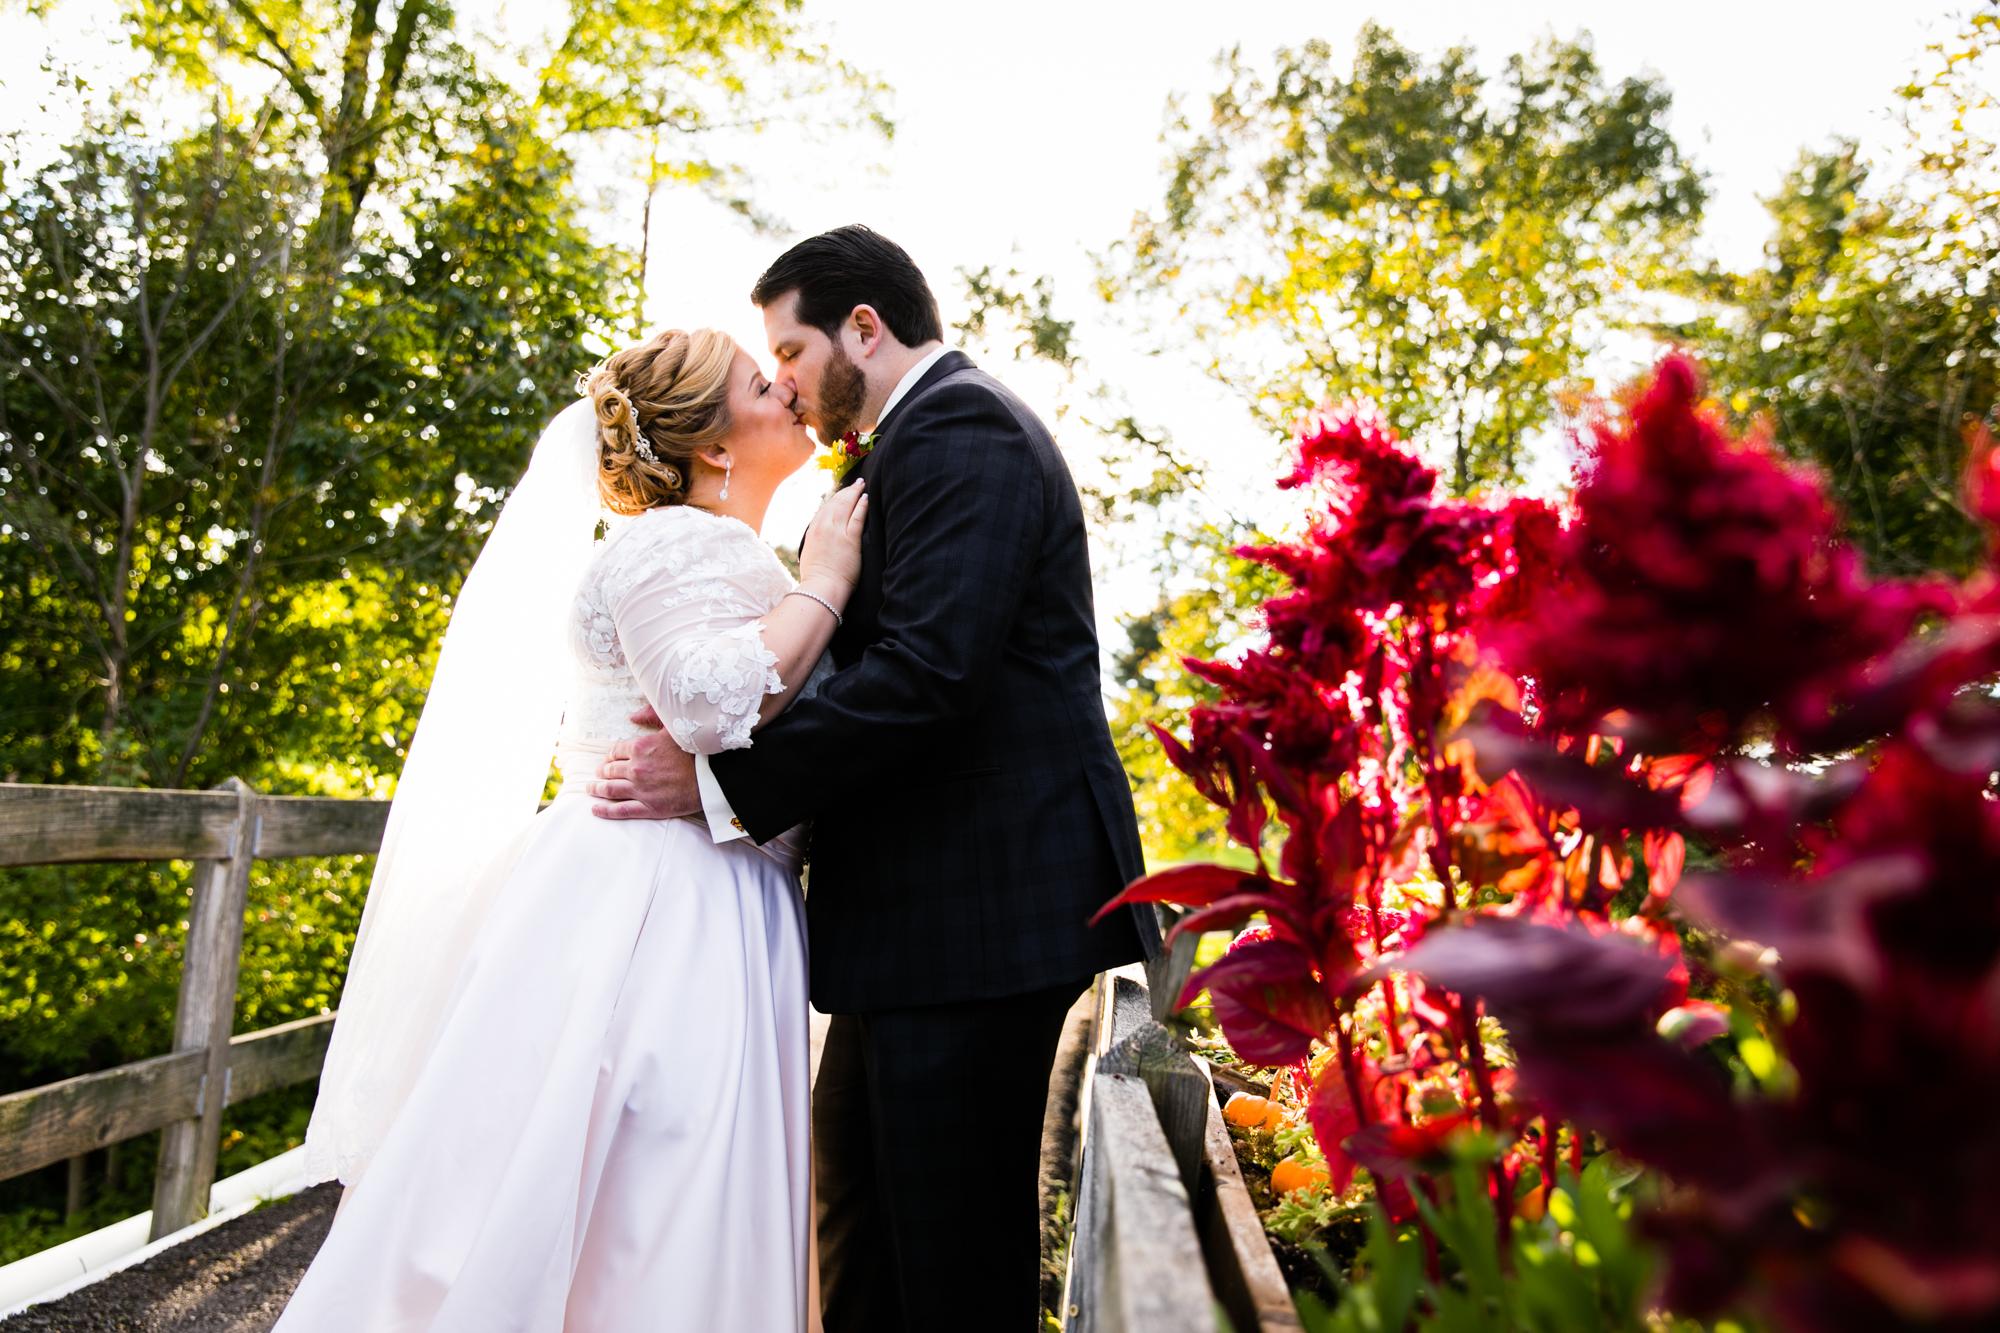 Cedar Brook Country Club Wedding Photography - Lovestruck Pictures-053.jpg